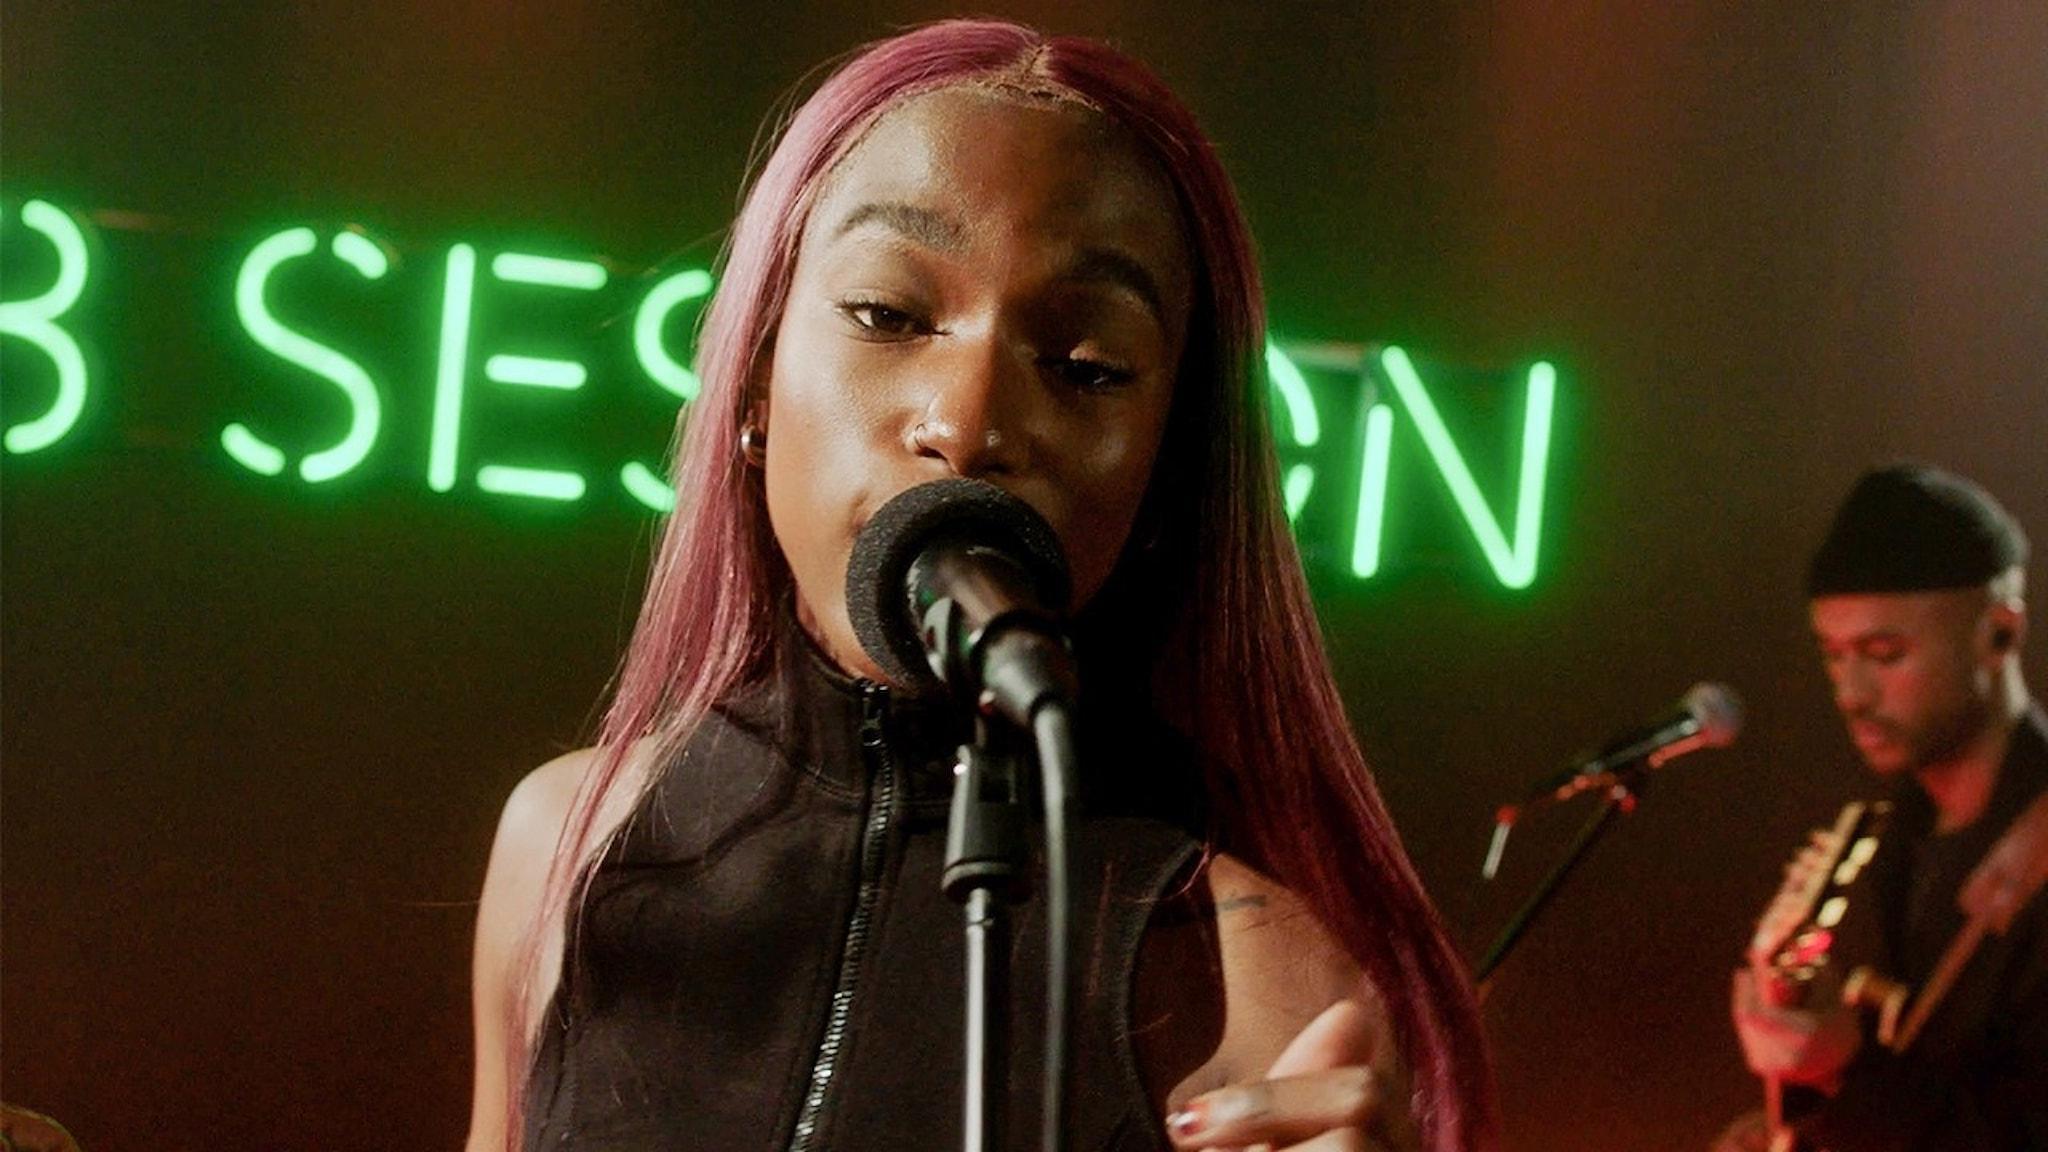 Sabina Ddumba sjunger på P3 Sessions scen.